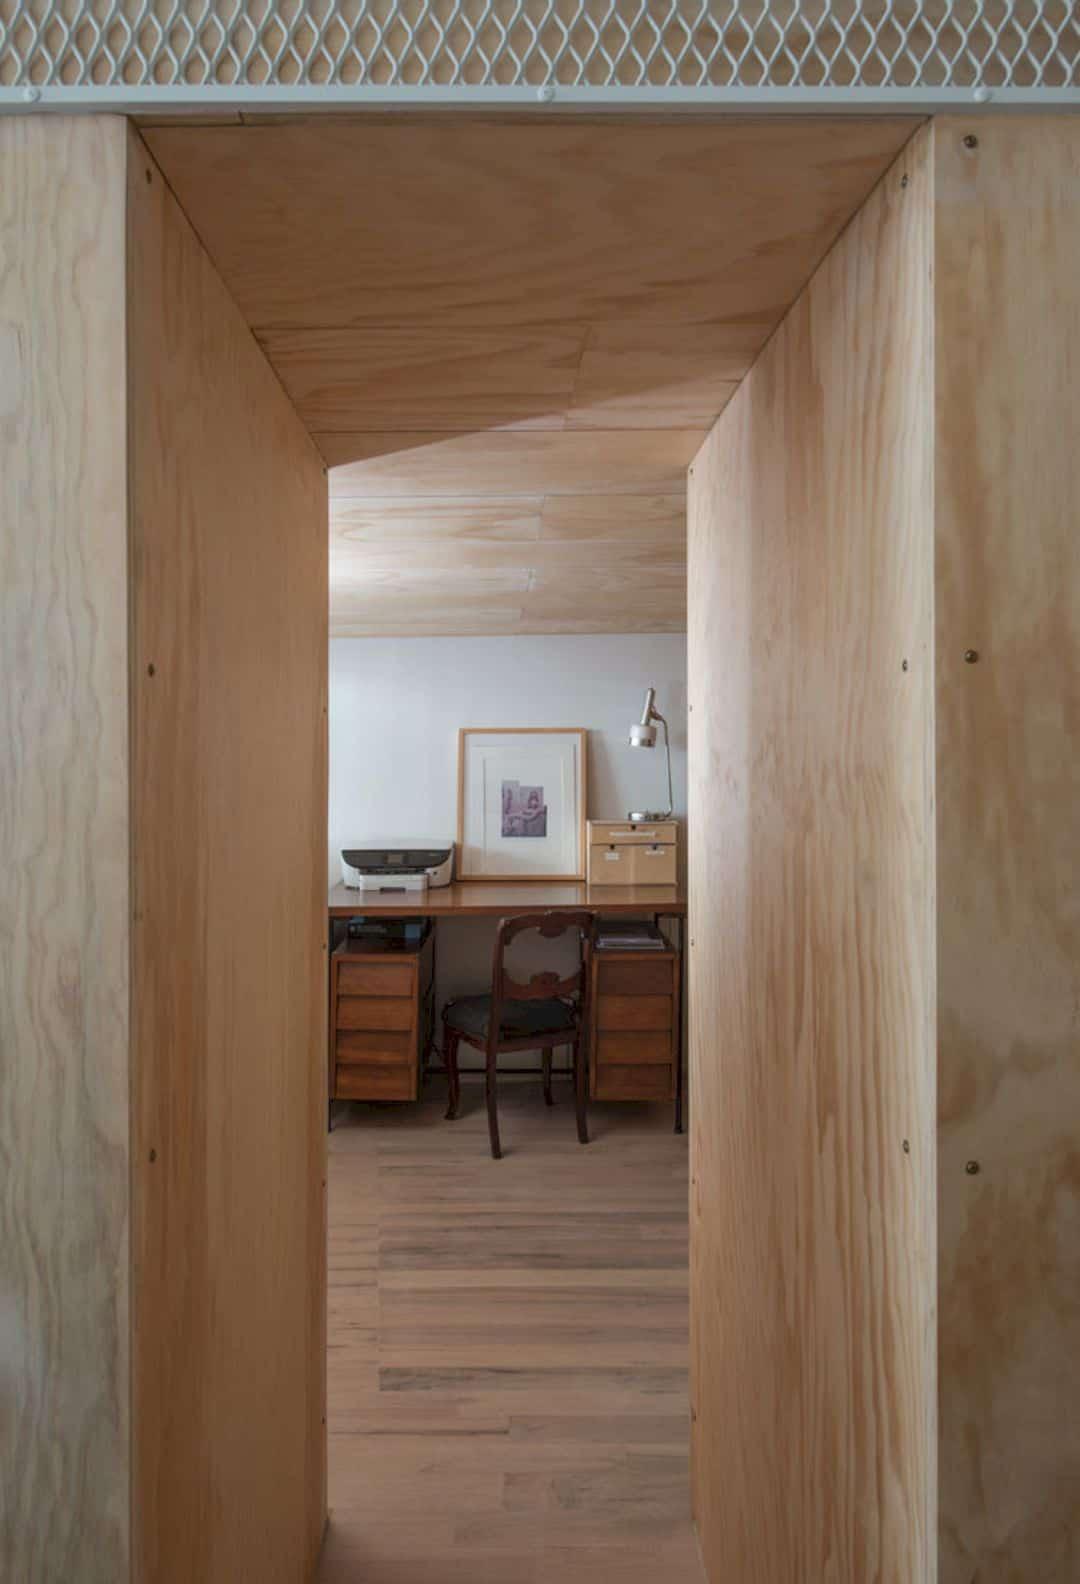 Bed Stuy Loft 2